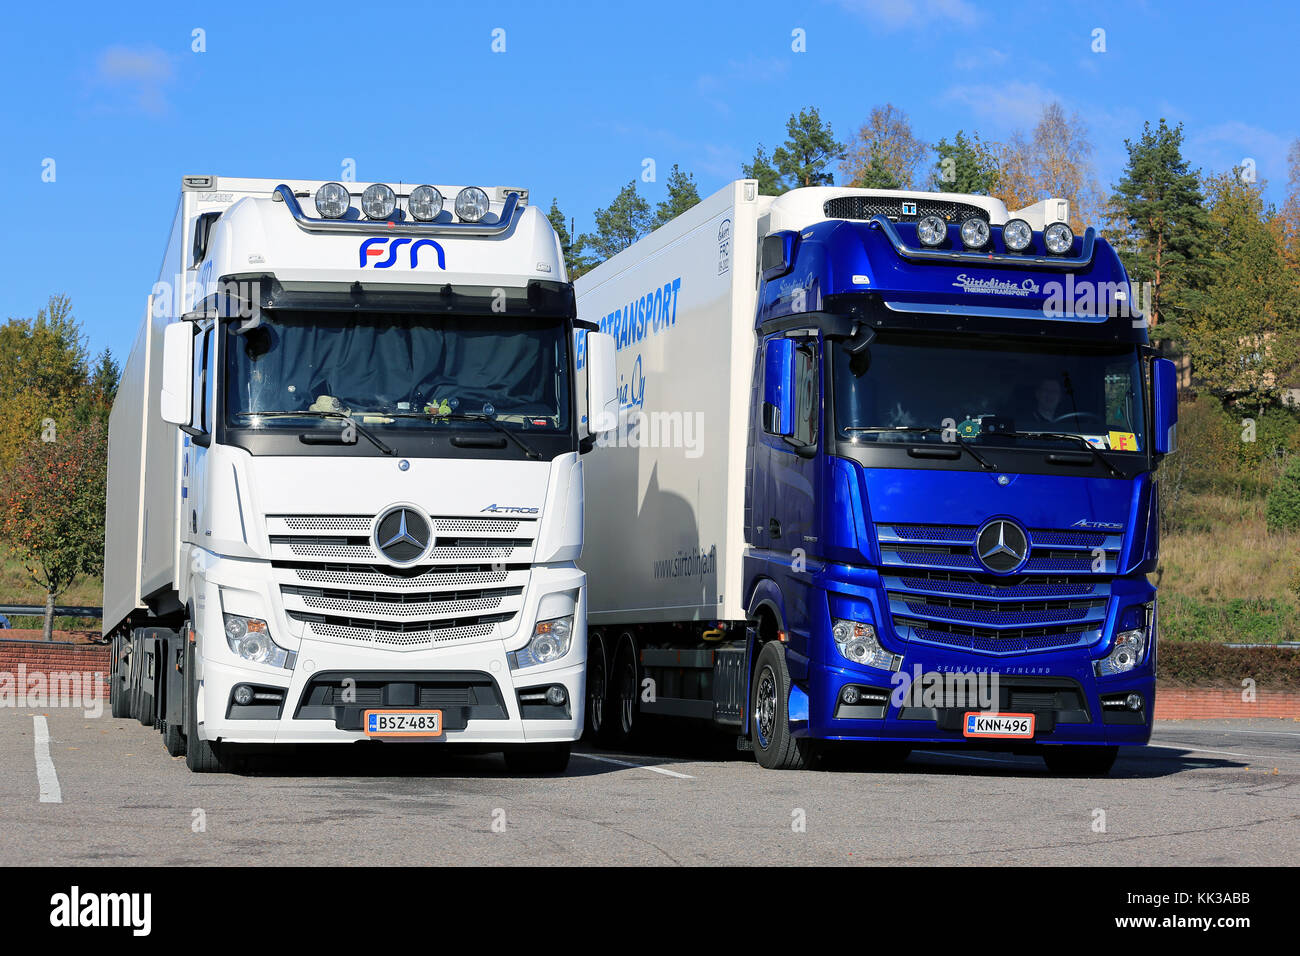 Truck Mercedes Benz Actros >> Mercedes Benz Actros Stock Photos & Mercedes Benz Actros Stock Images - Alamy